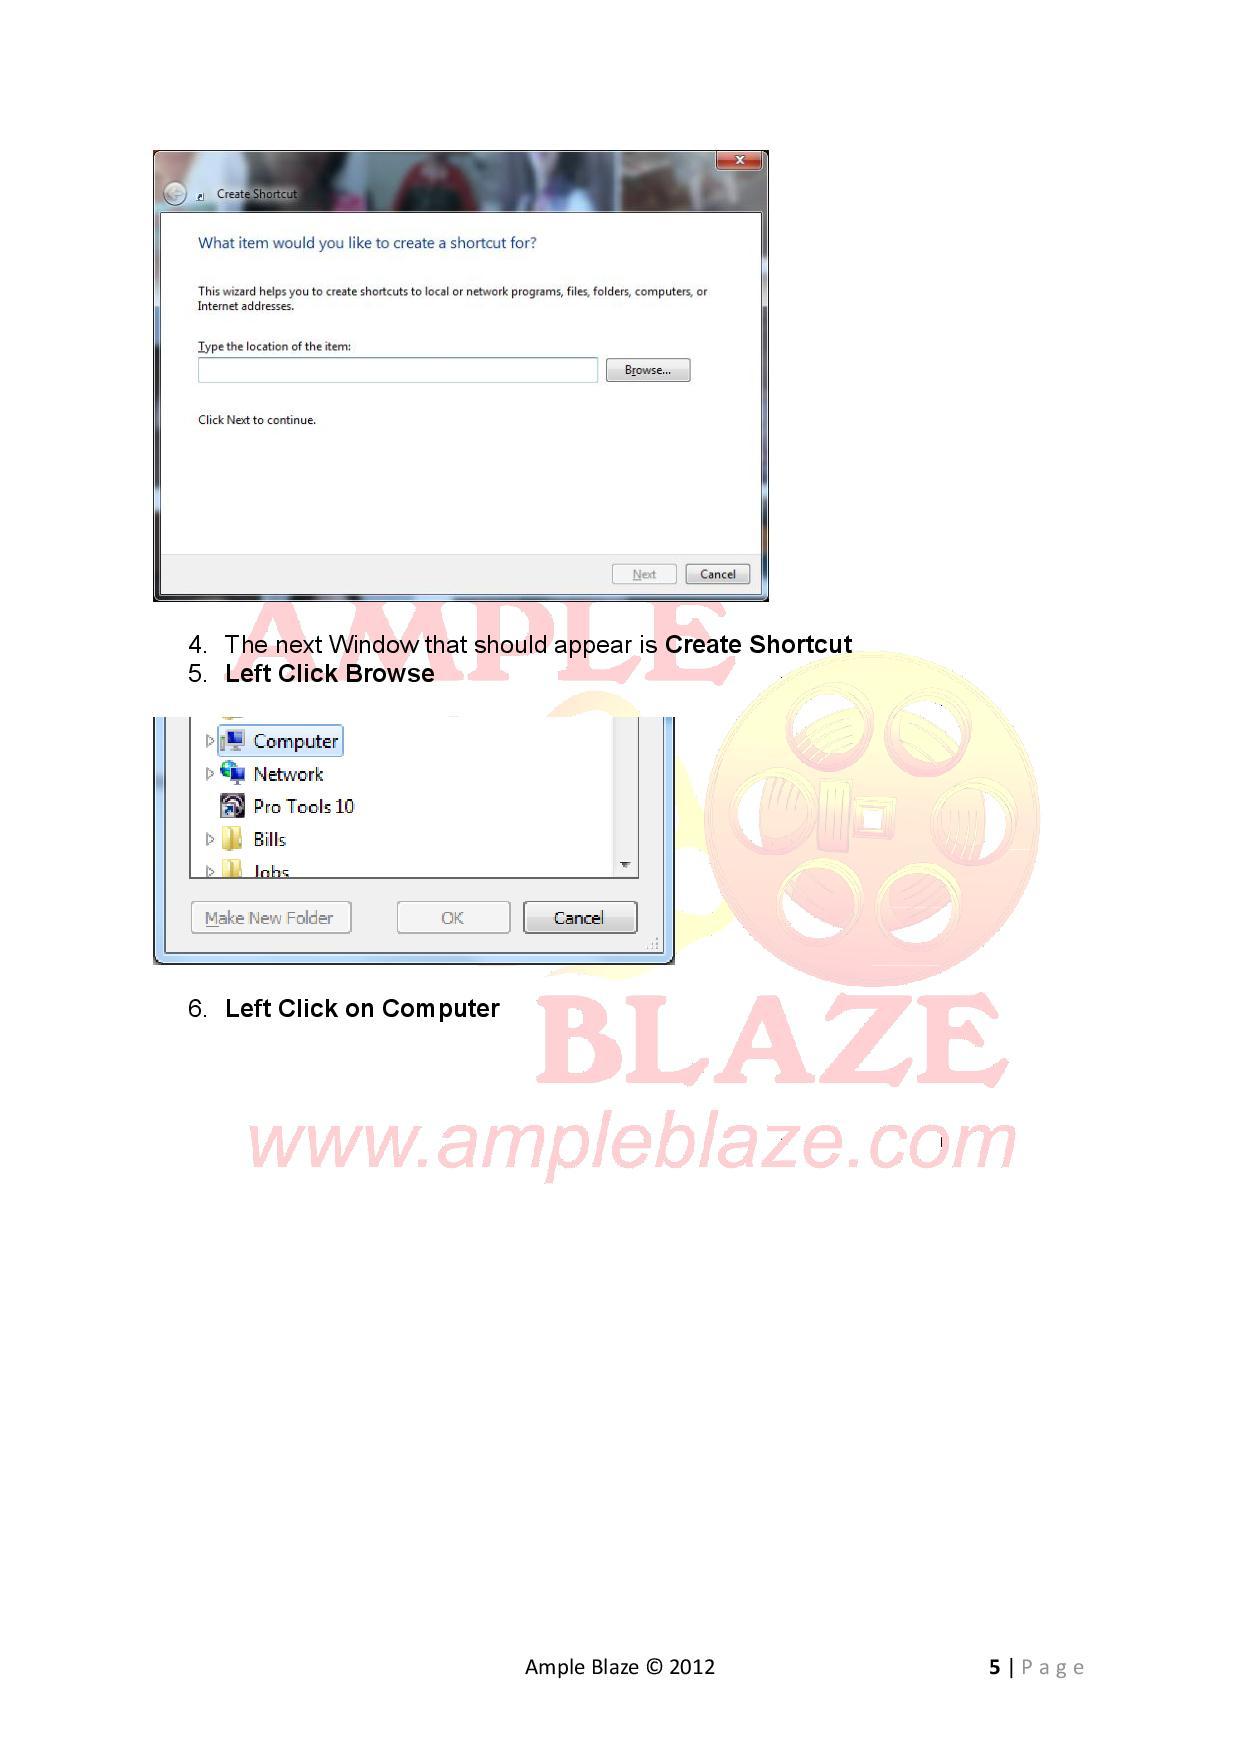 Ample Blaze Create Shortcut Windows 7-page-005